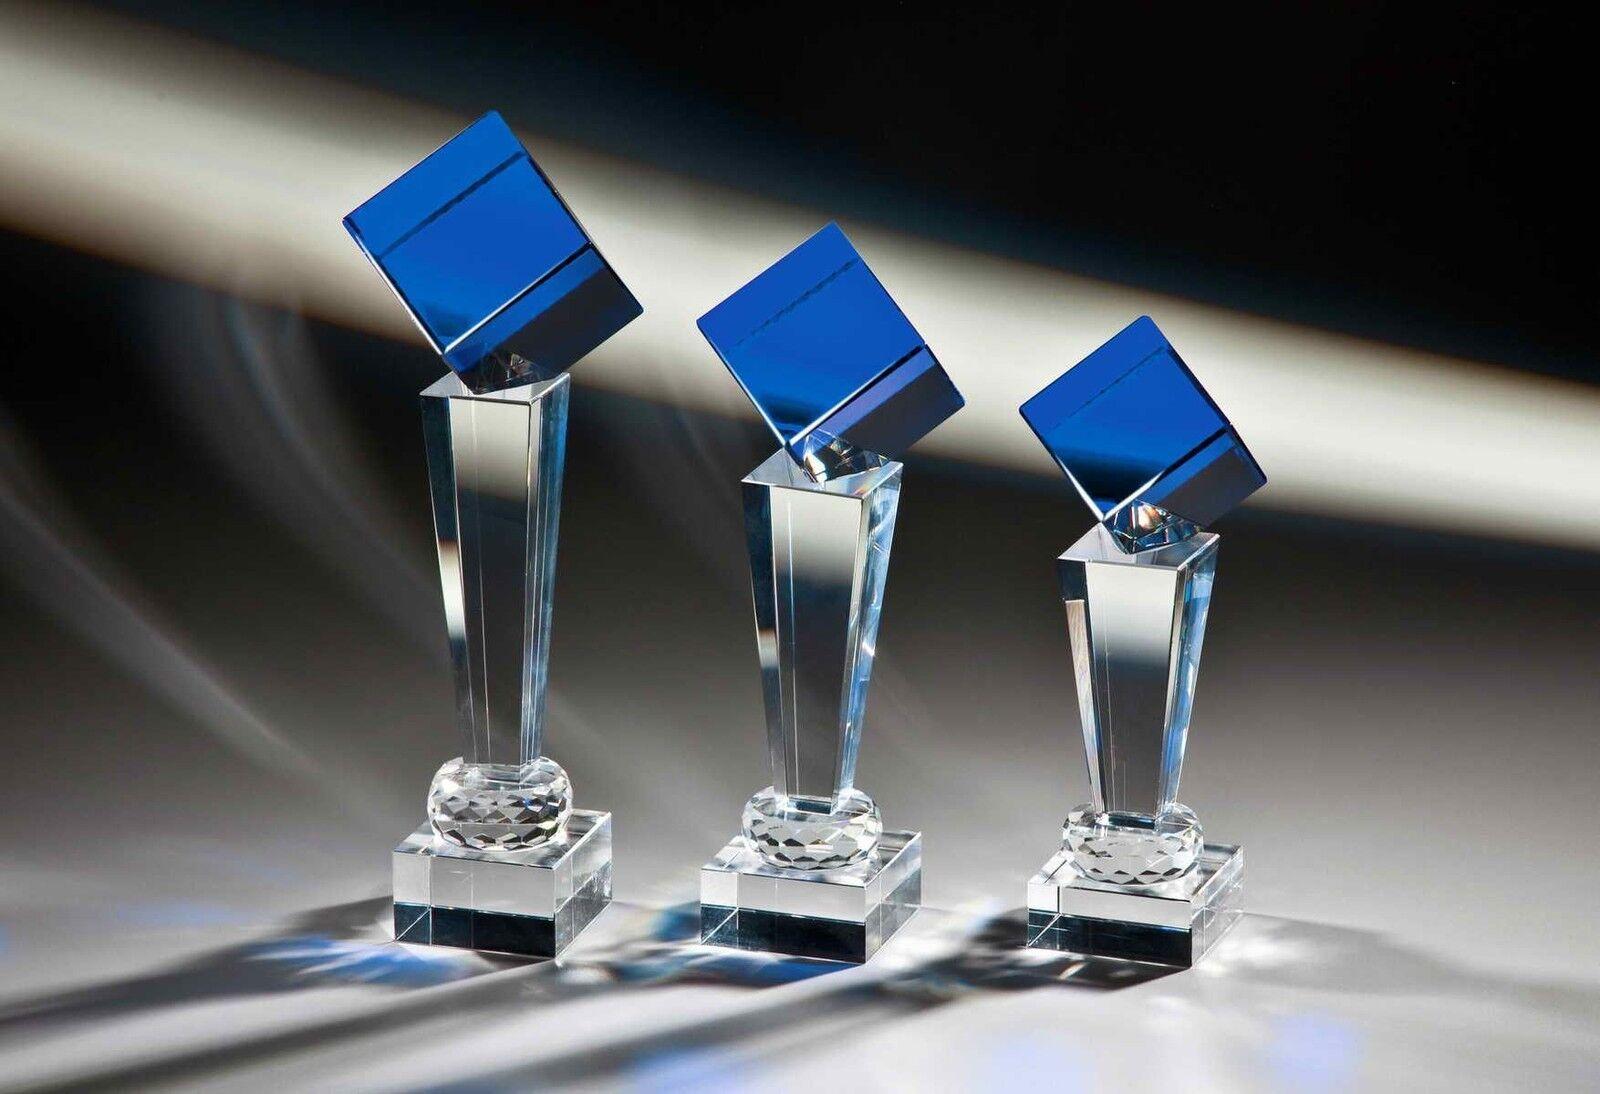 1 Noblesseglas Glaspokal Blau 24cm  129(Wander-Pokal Jubiläum Turnier Pokal)